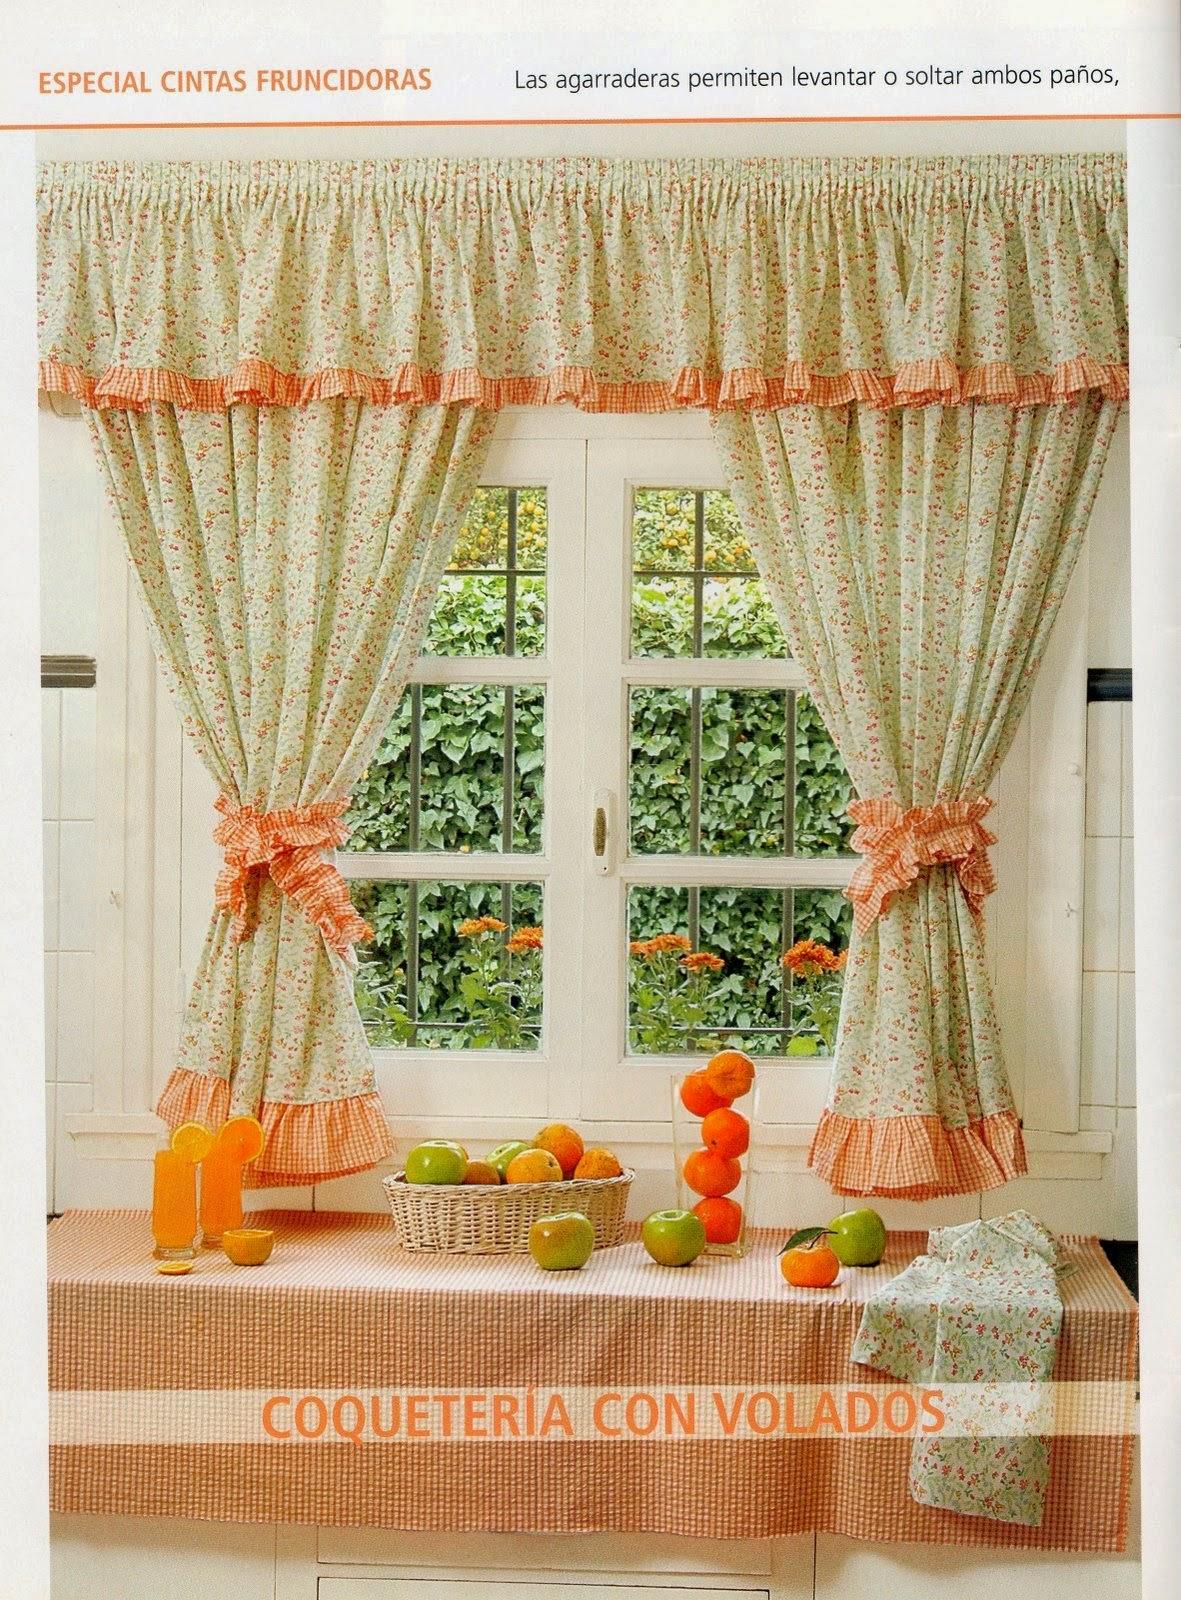 Como hacer cortinas paso a paso revistas de manualidades gratis - Cortinas de cocina ...